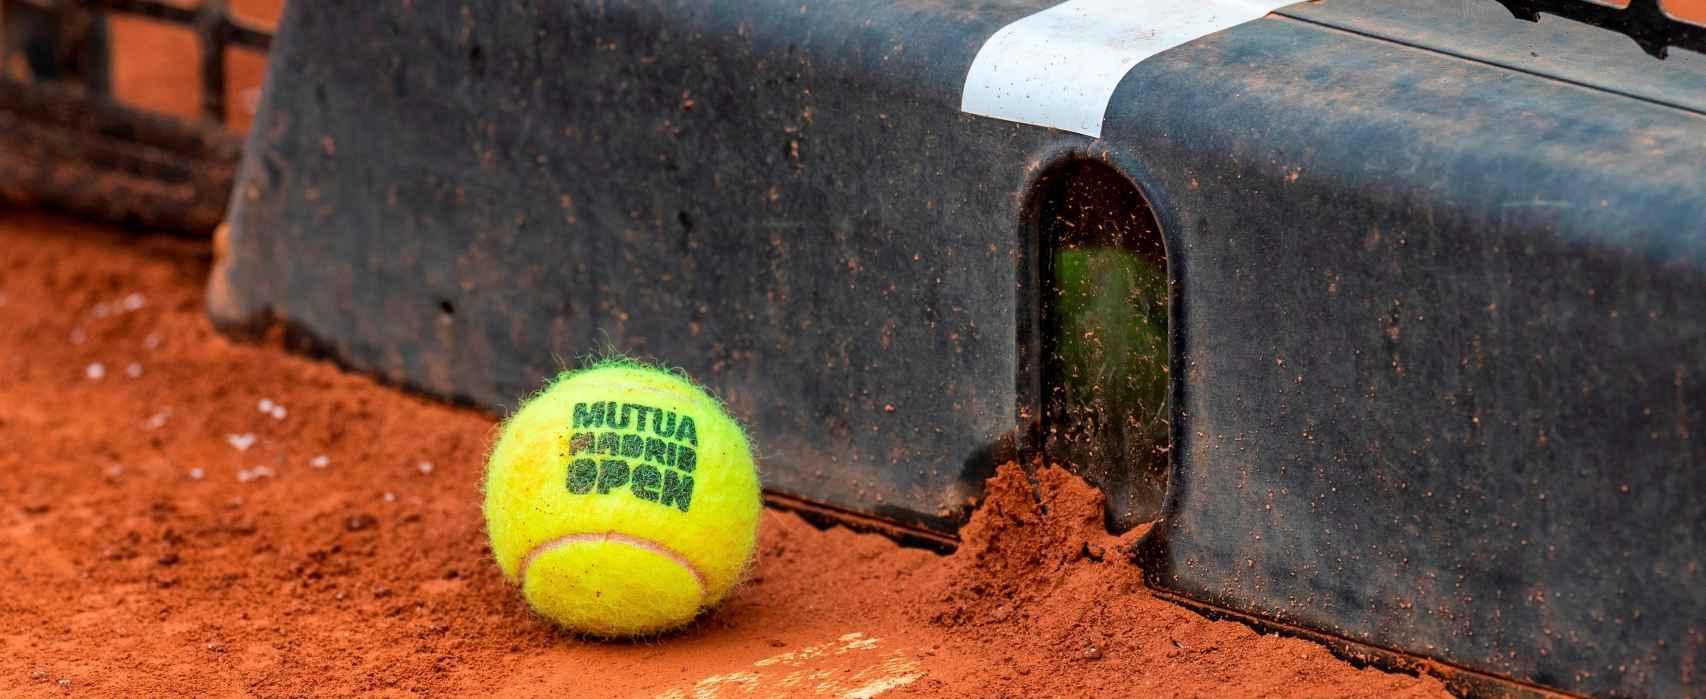 Alexander Zverev - Dominic Thiem, semifinal del Mutua Madrid Open